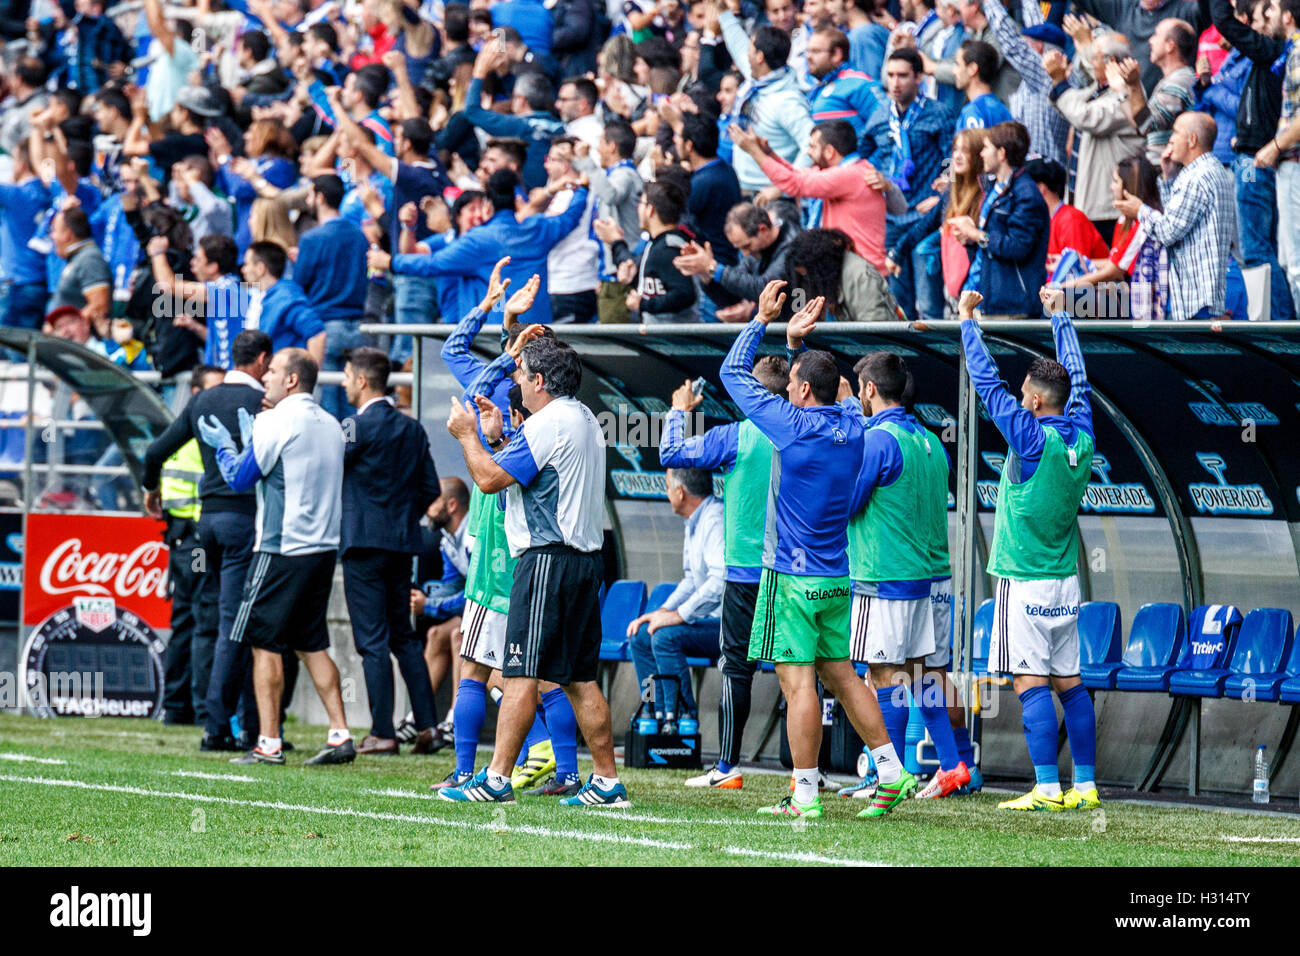 Carlos Tartiere stadium, Oviedo, Asturias, Spain. 2nd October, 2016. Liga 123 match between Real Oviedo v CD Numancia. - Stock Image